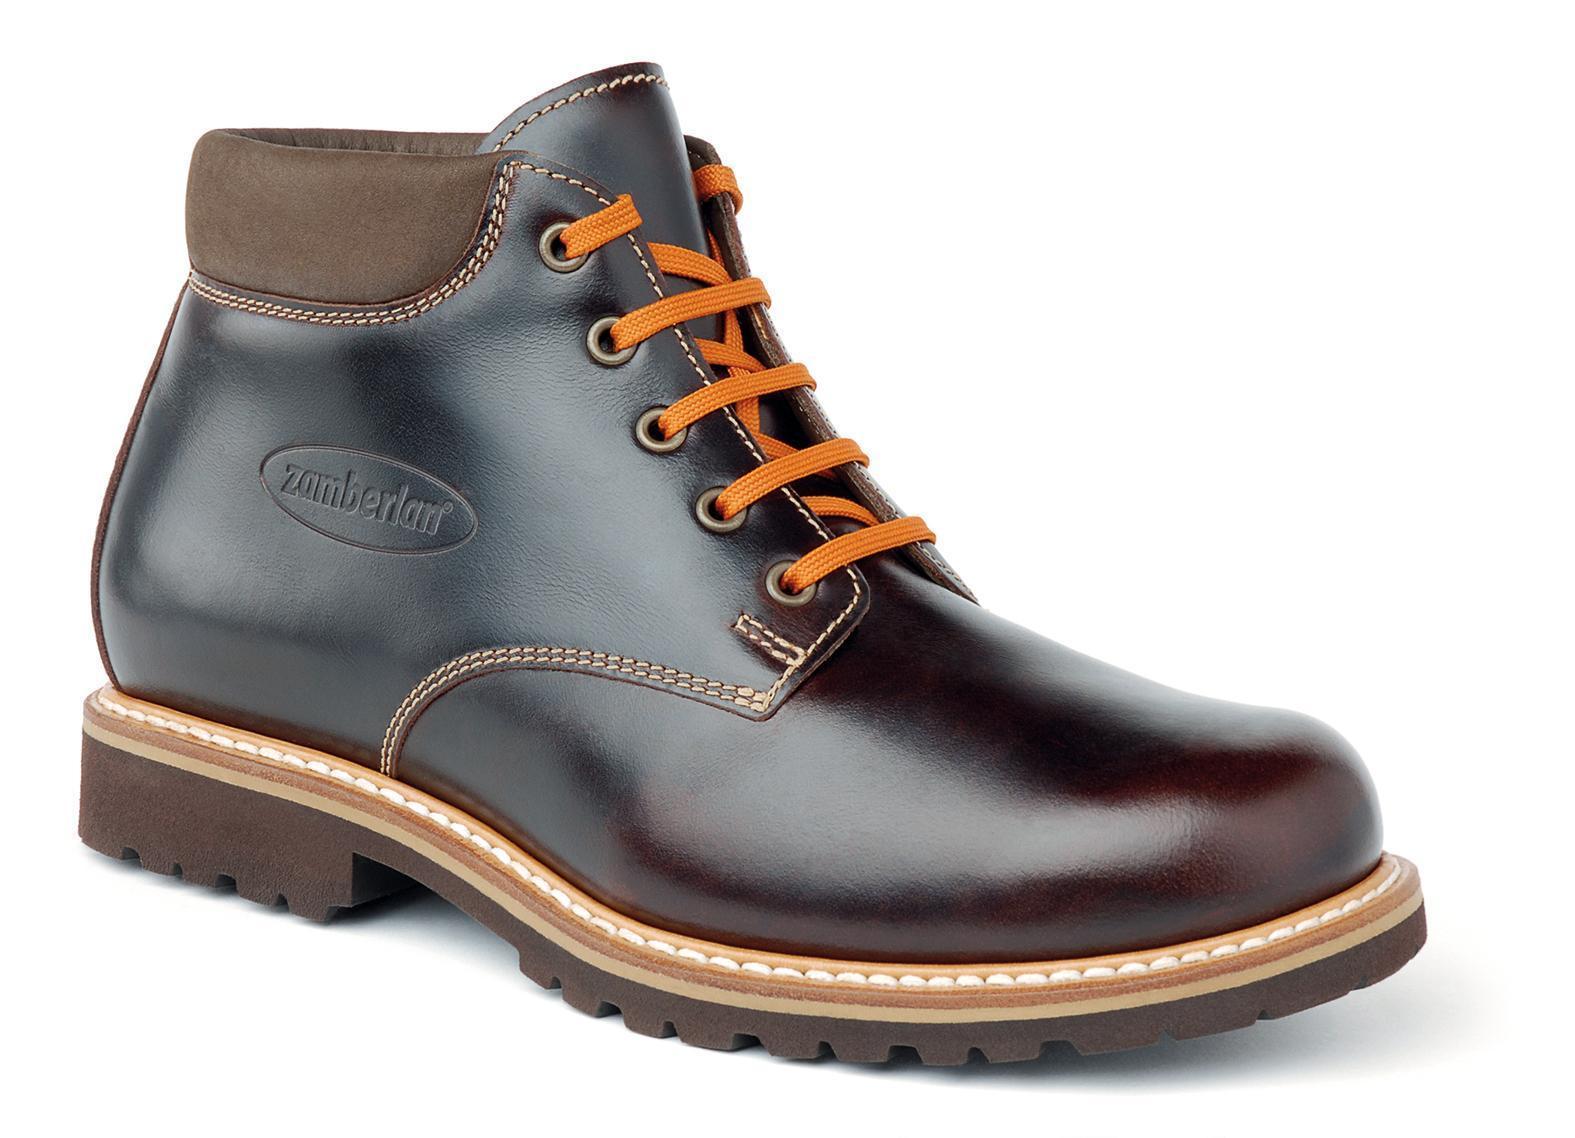 Zamberlan 1132 Siena Gw Men39s Goodyear Welted Boots